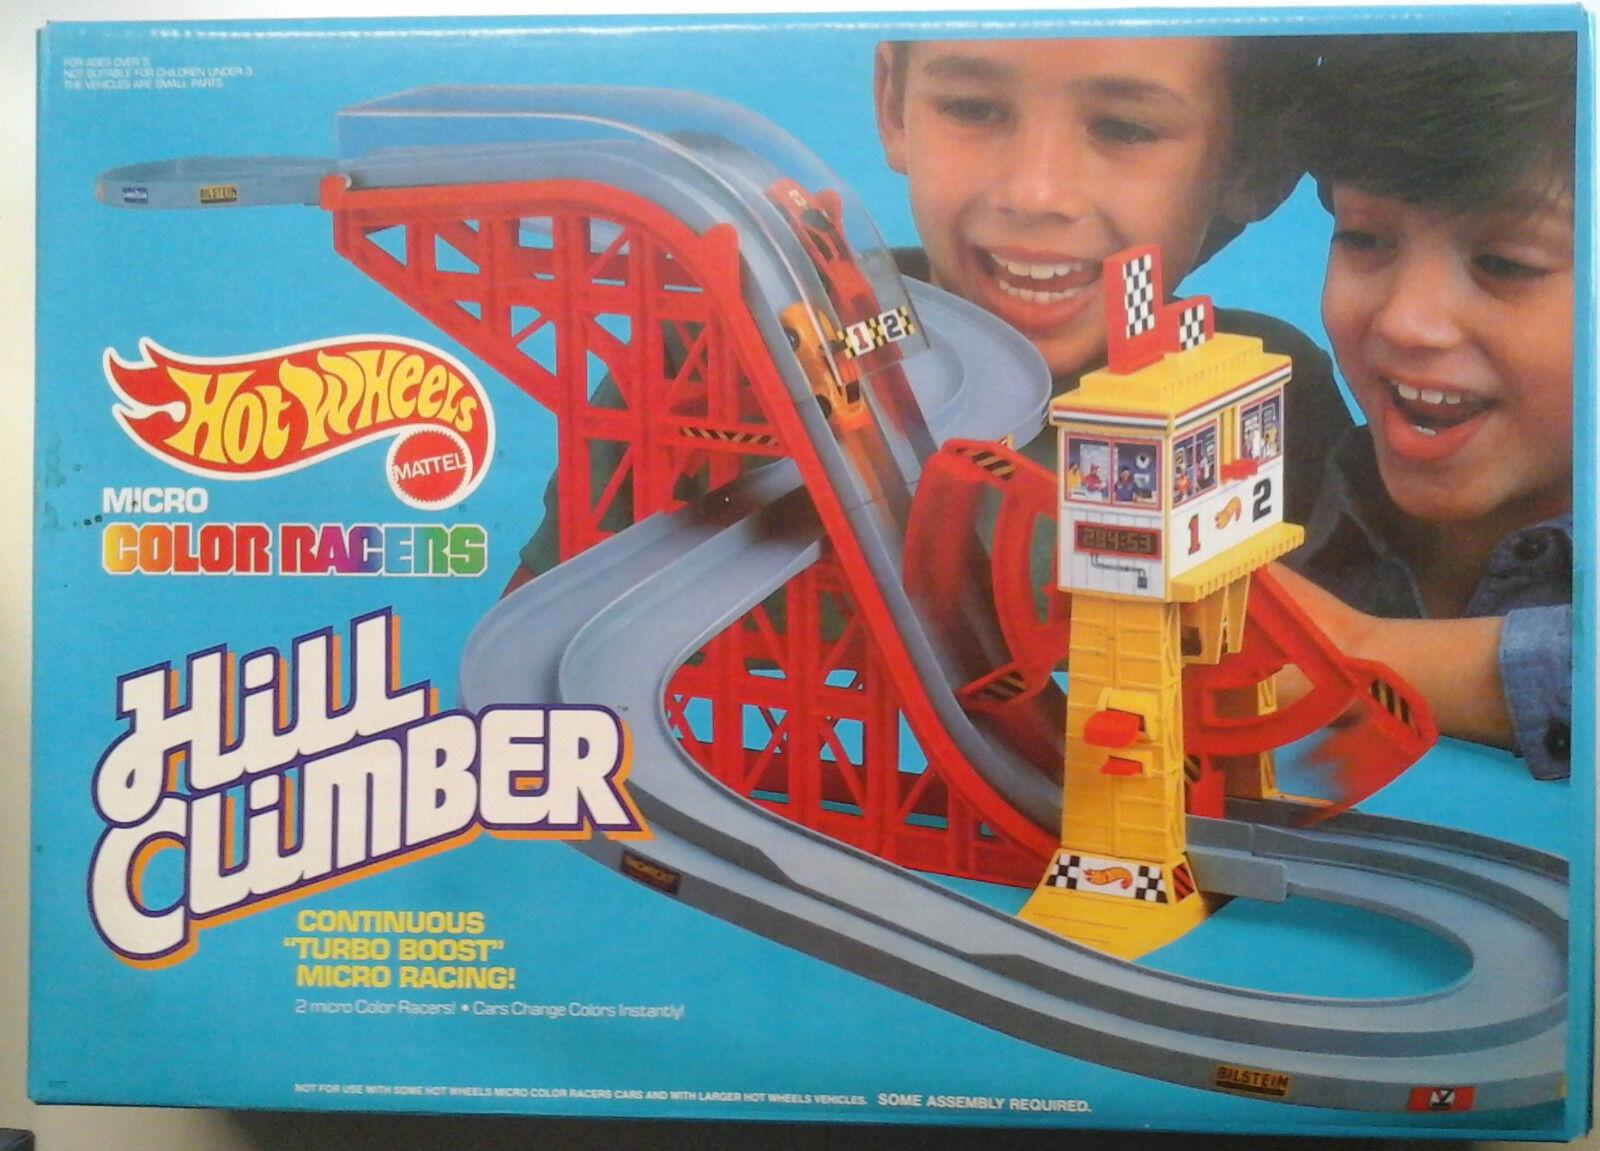 Hot wheels - mikro - farbe rennfahrer - hill bergsteiger - mattel - vintage - 1989